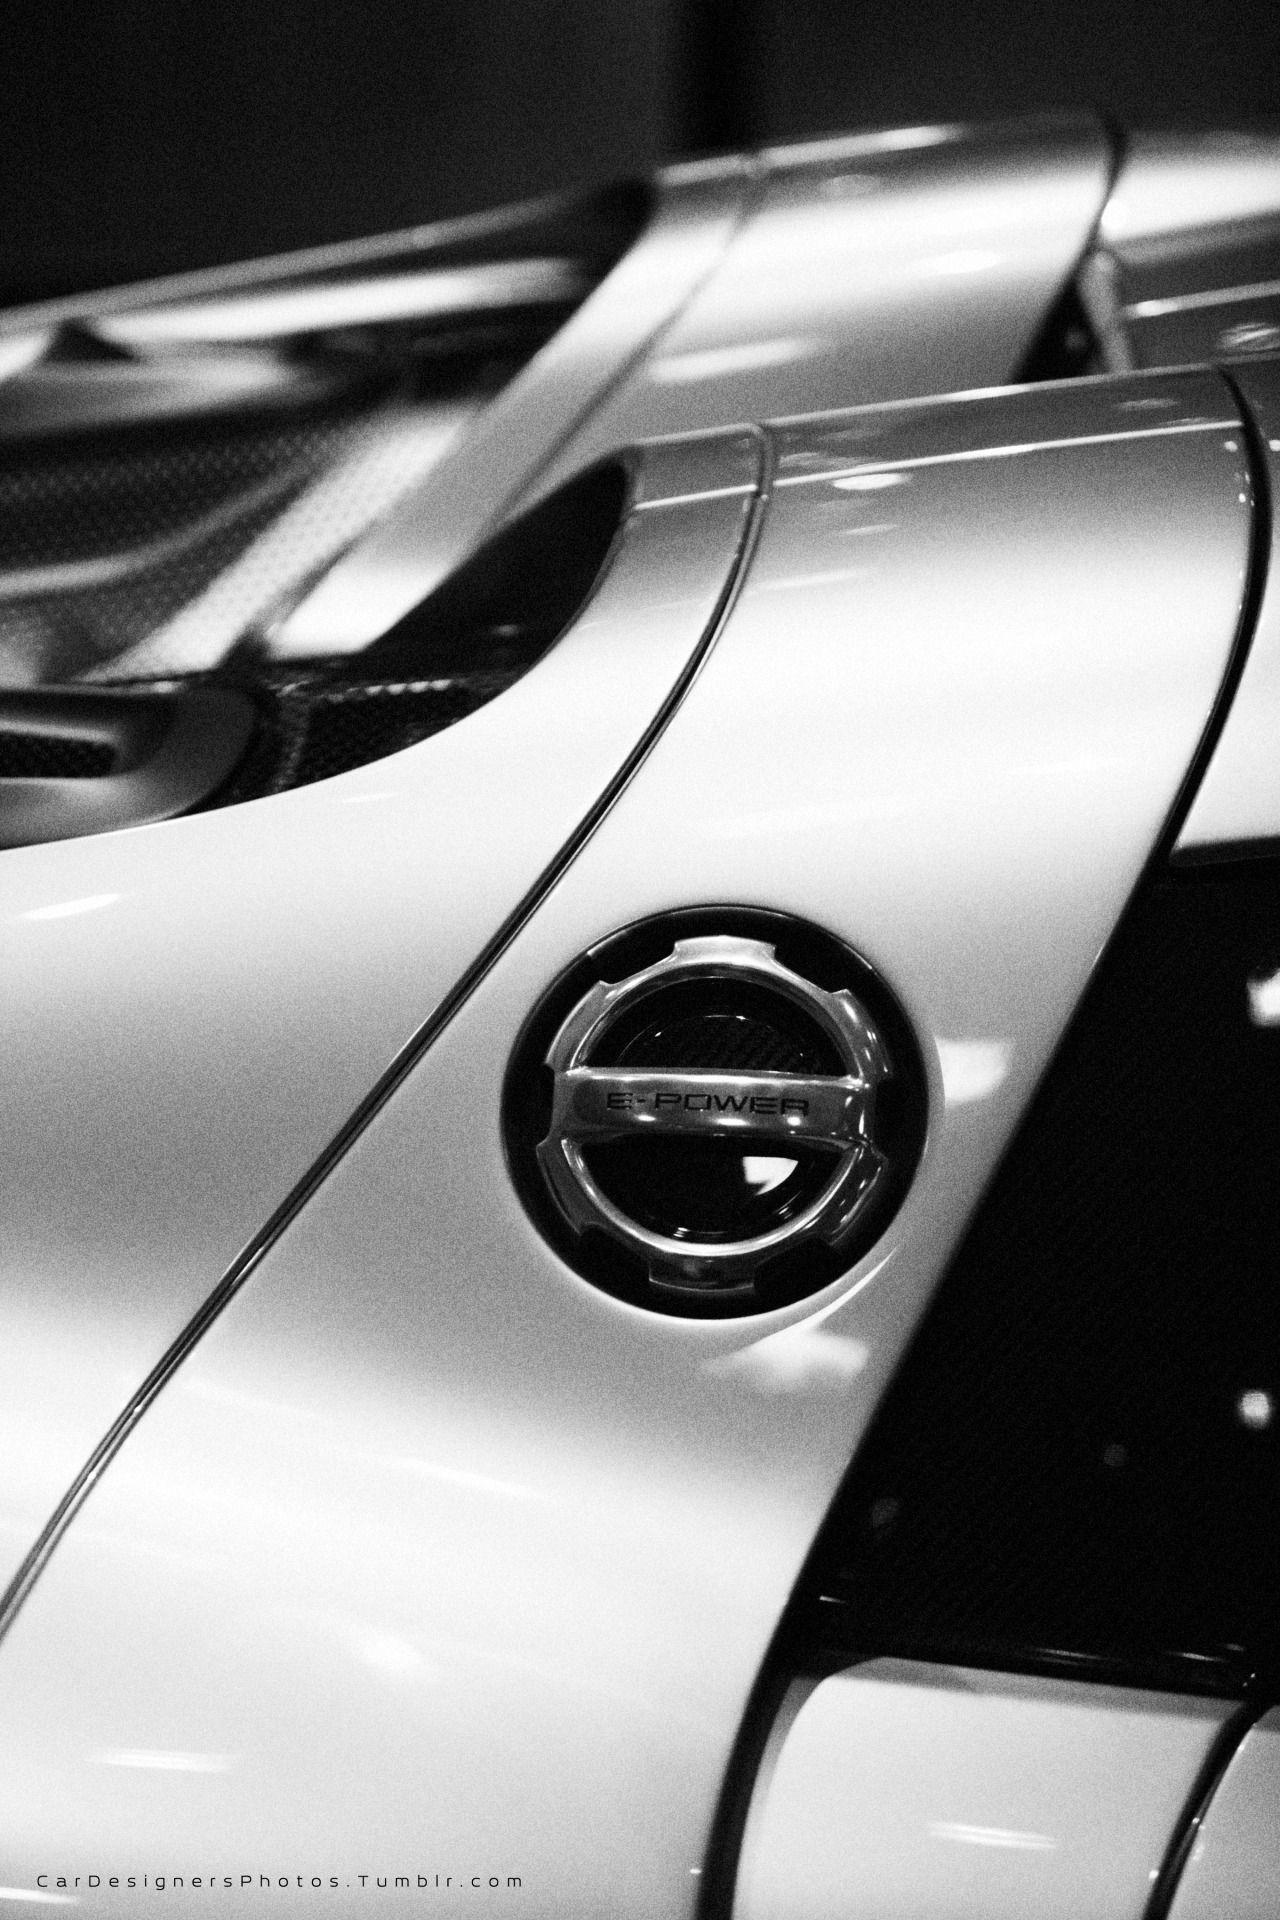 car designer s photos by samir sadikhov transport Corvette Concept Car car designer s photos by samir sadikhov future transportation automotive photography mechanical design